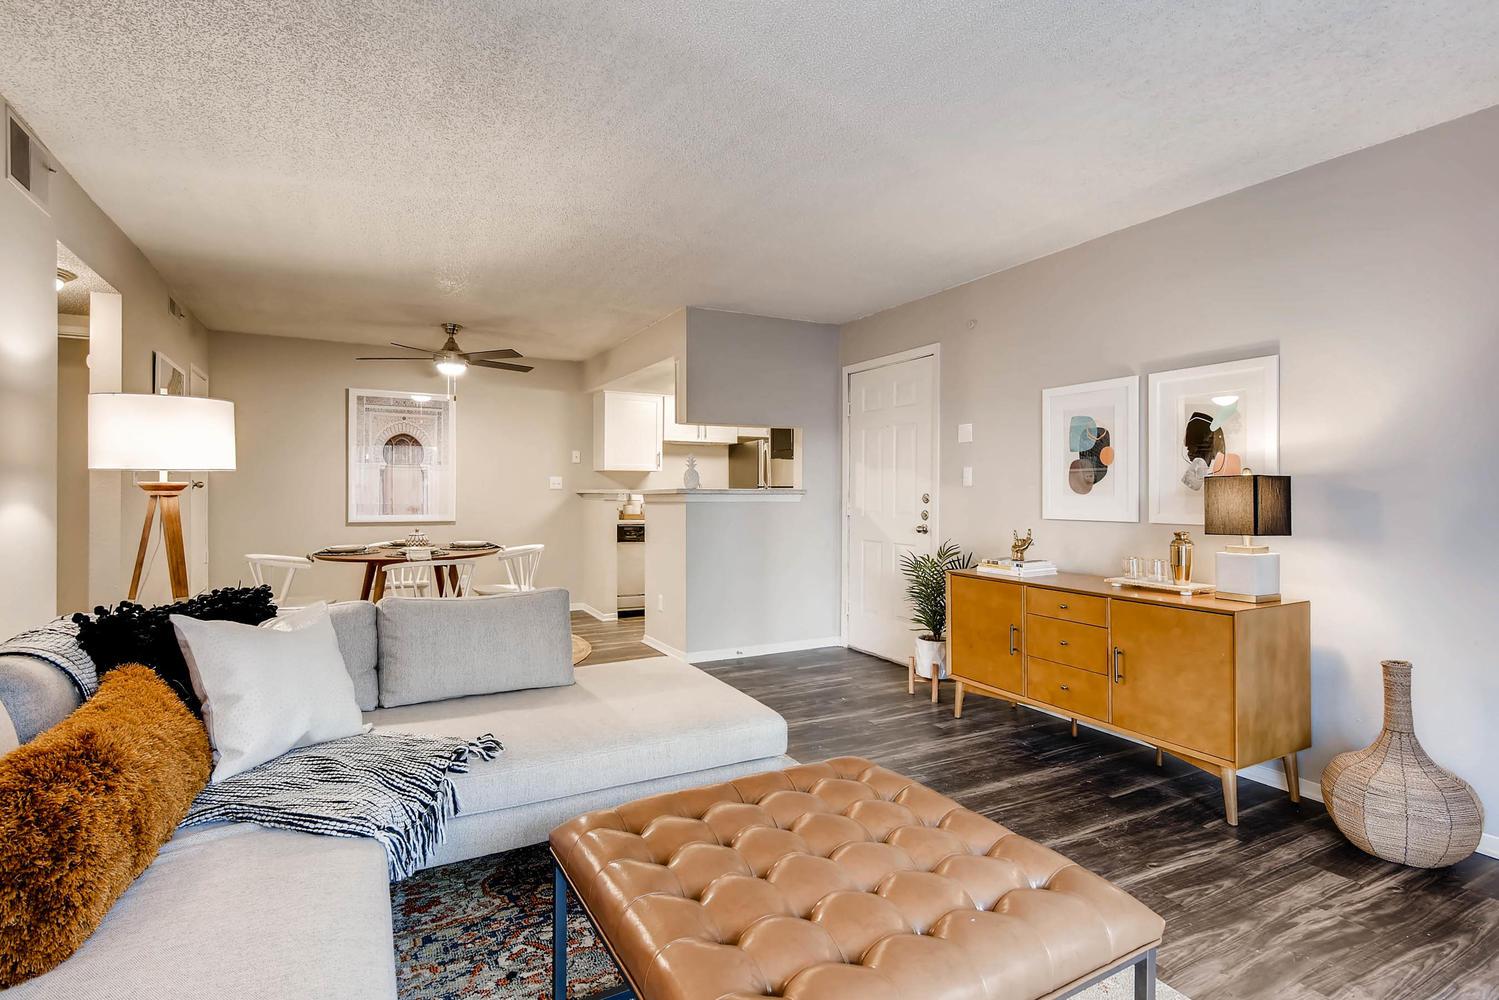 2890 W 116th Pl Westminster CO-large-004-8-Living Room-1500x1000-72dpi.jpg